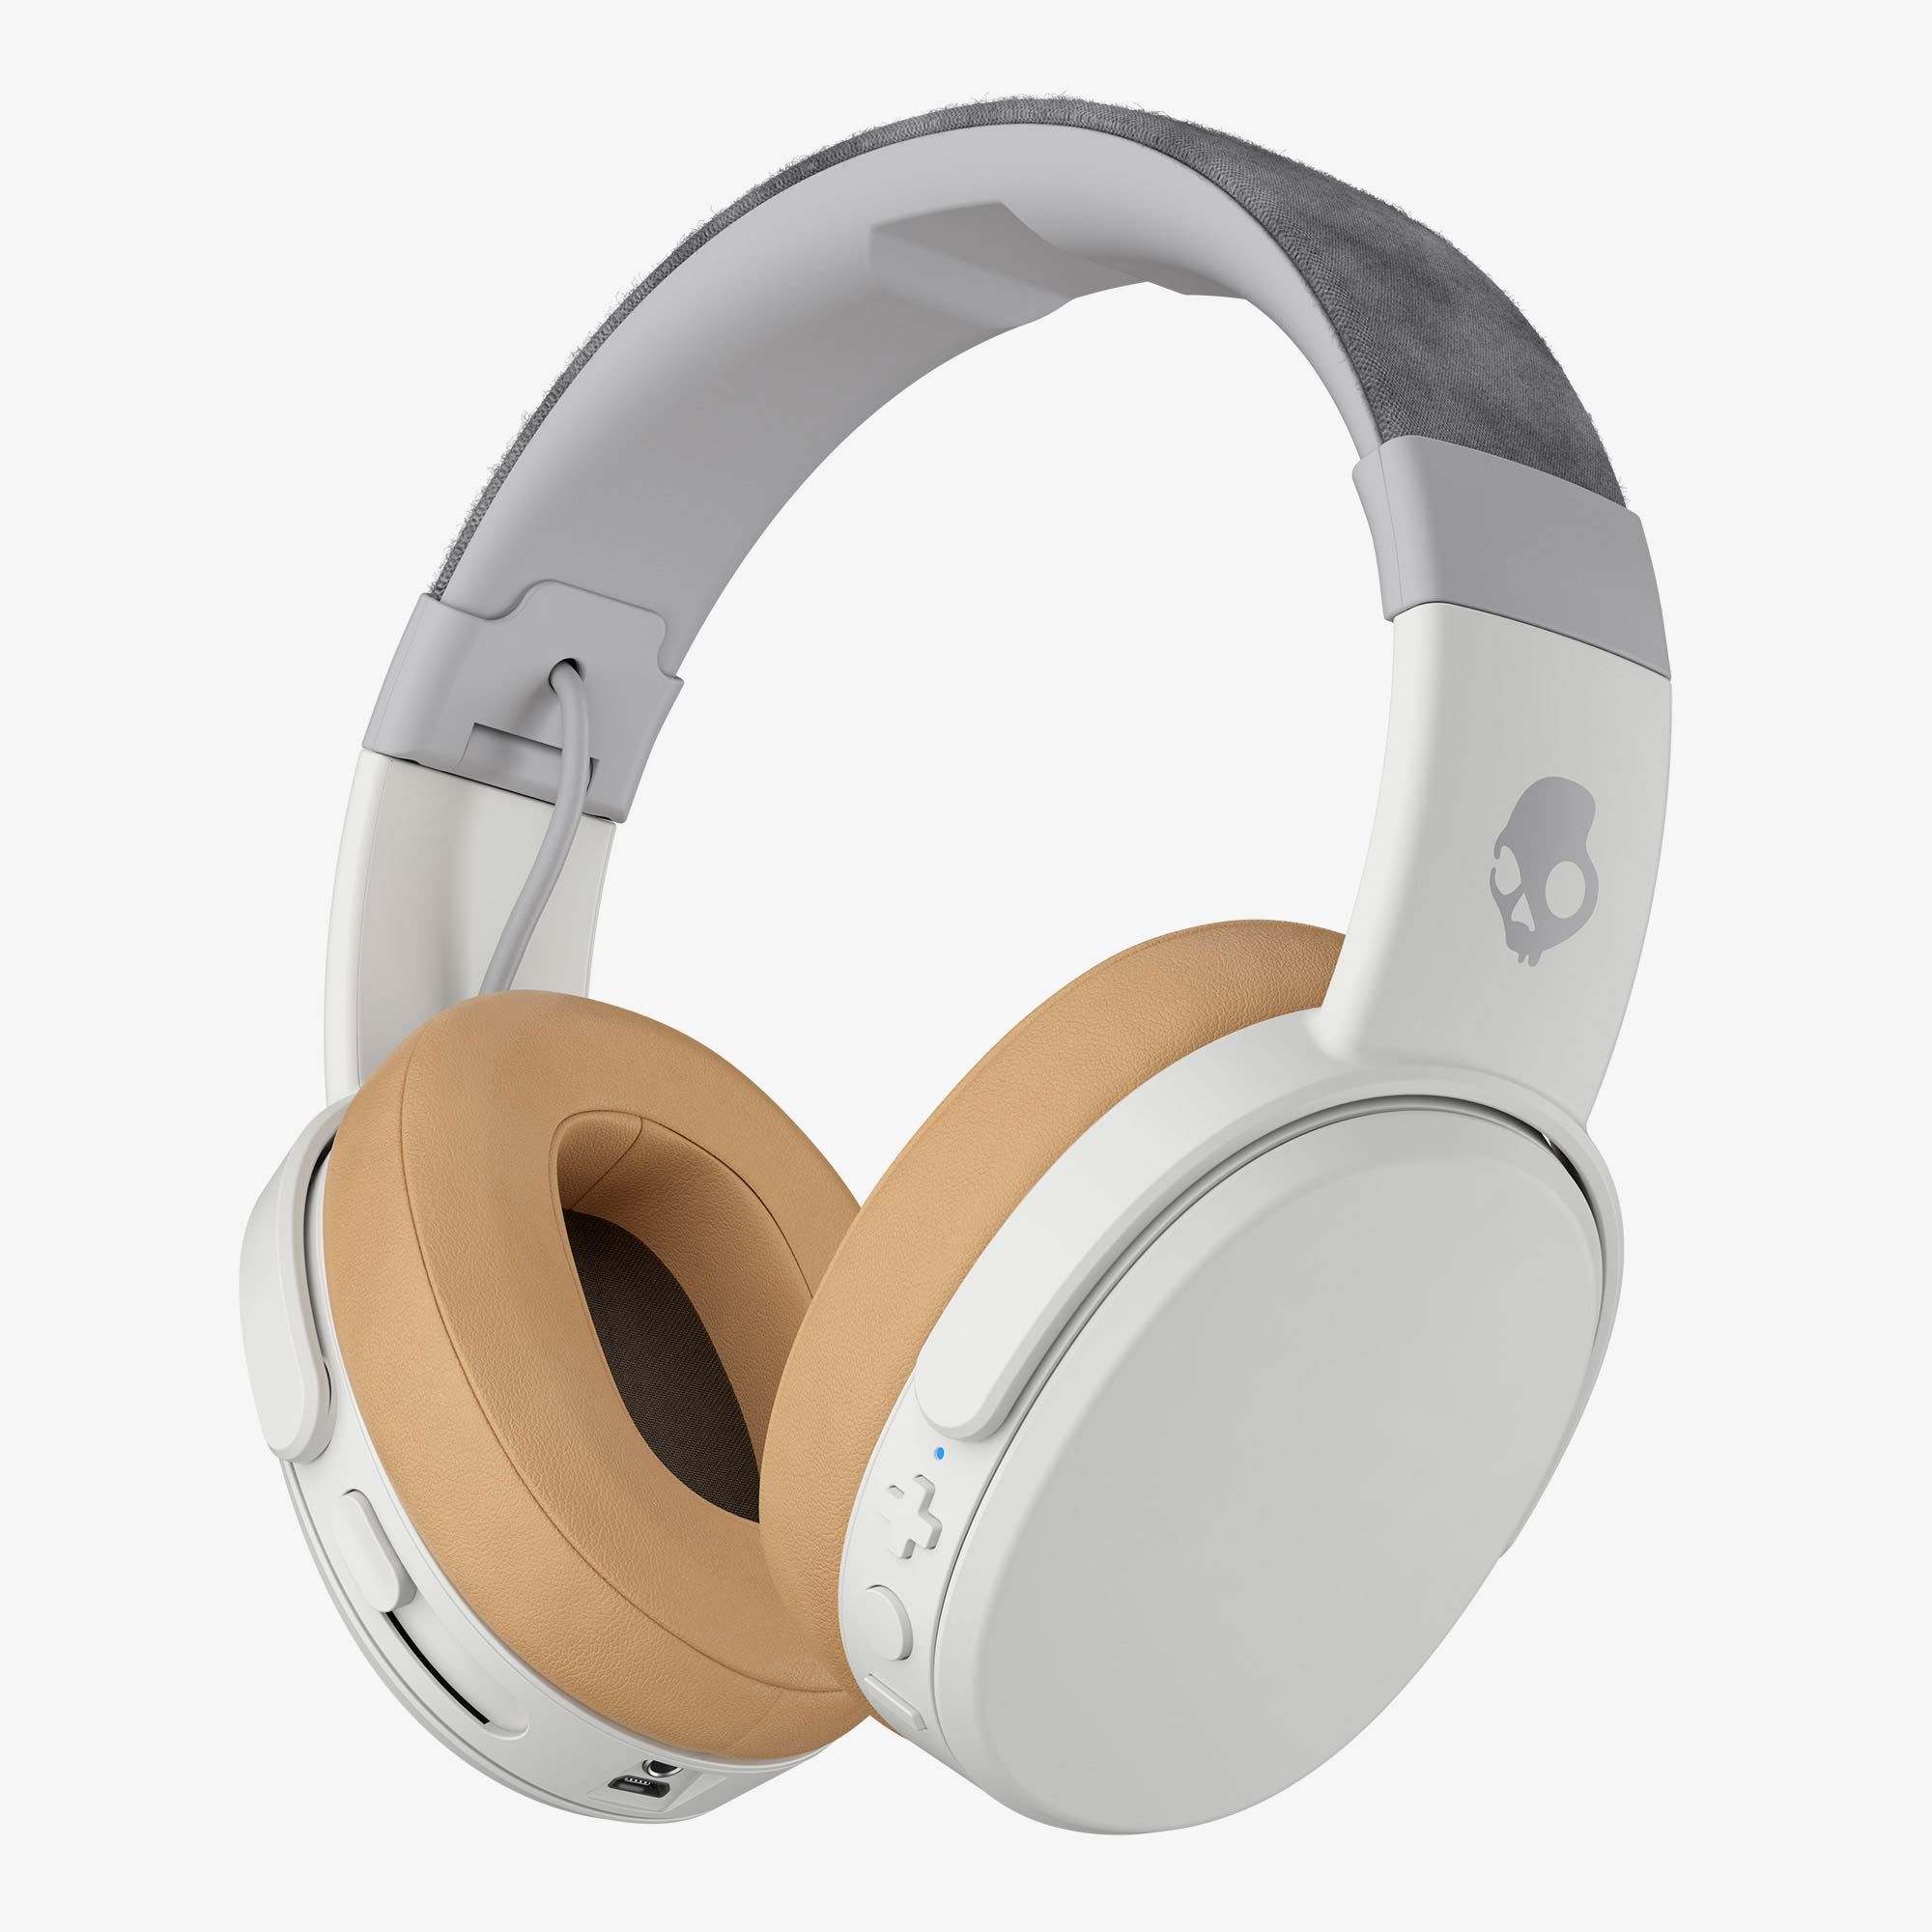 4104de844a9 Audio :: Headphones :: Over-Ear Headphone :: Skullcandy :: SkullCandy  Crusher Wireless Headphone - Black - Best Price, Free Shipping, 30Days  Money-Back ...